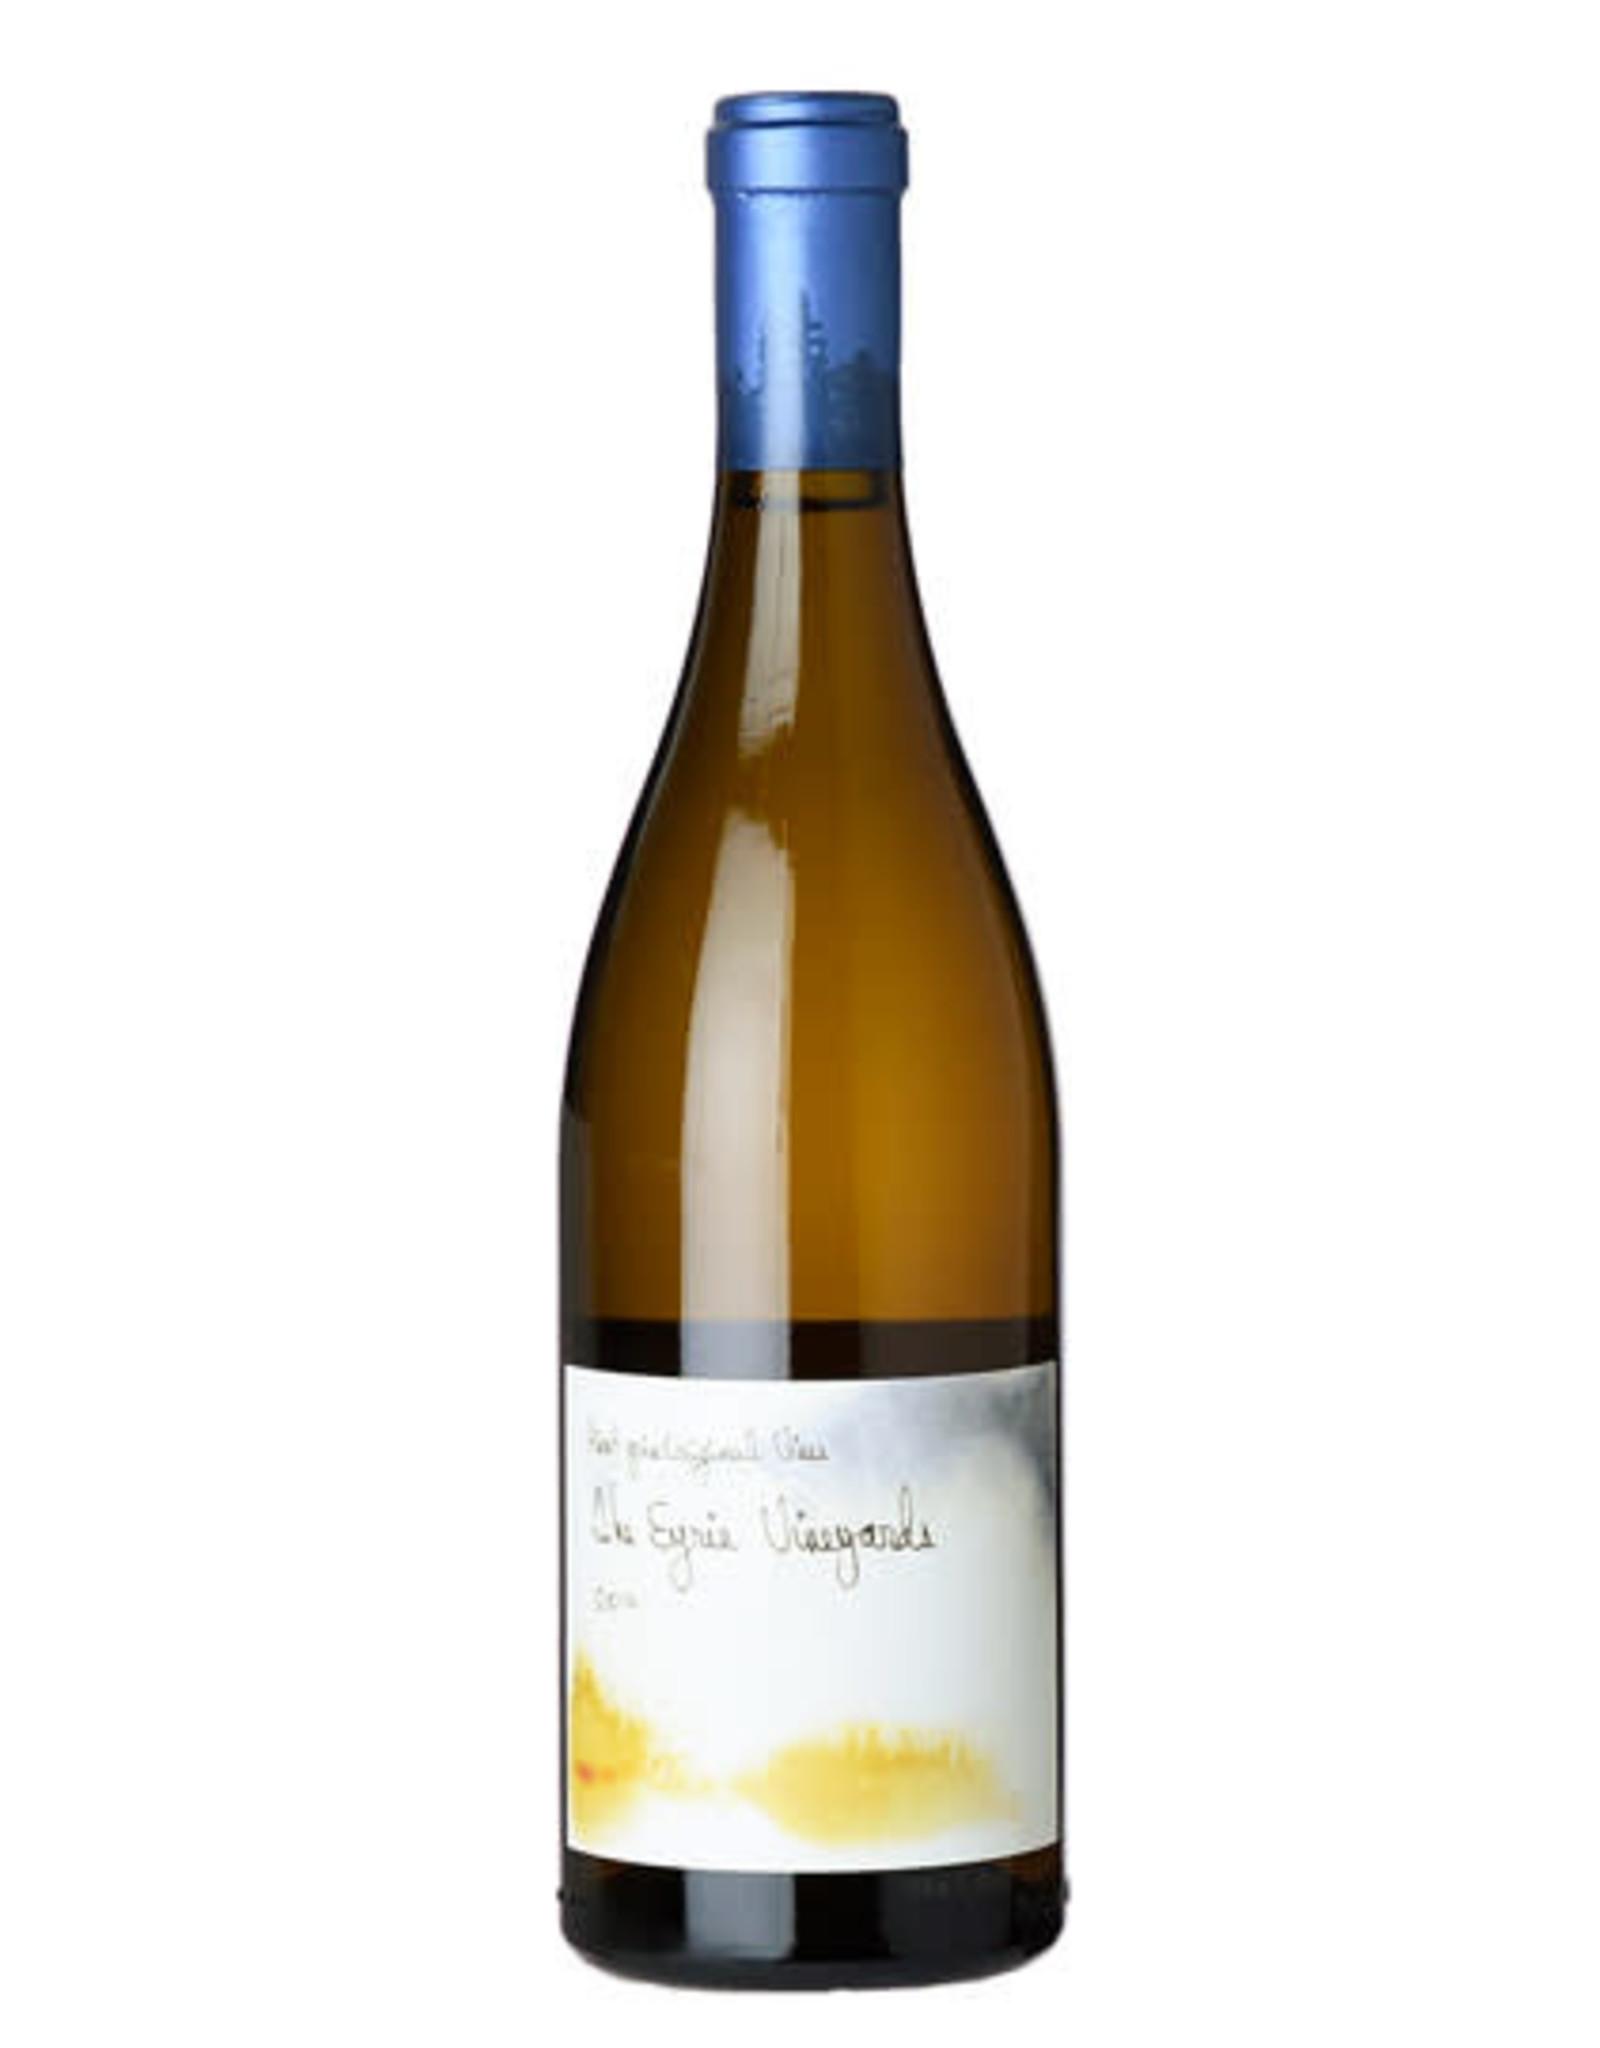 Eyrie Original Vines Pinot Gris Willamette 2015